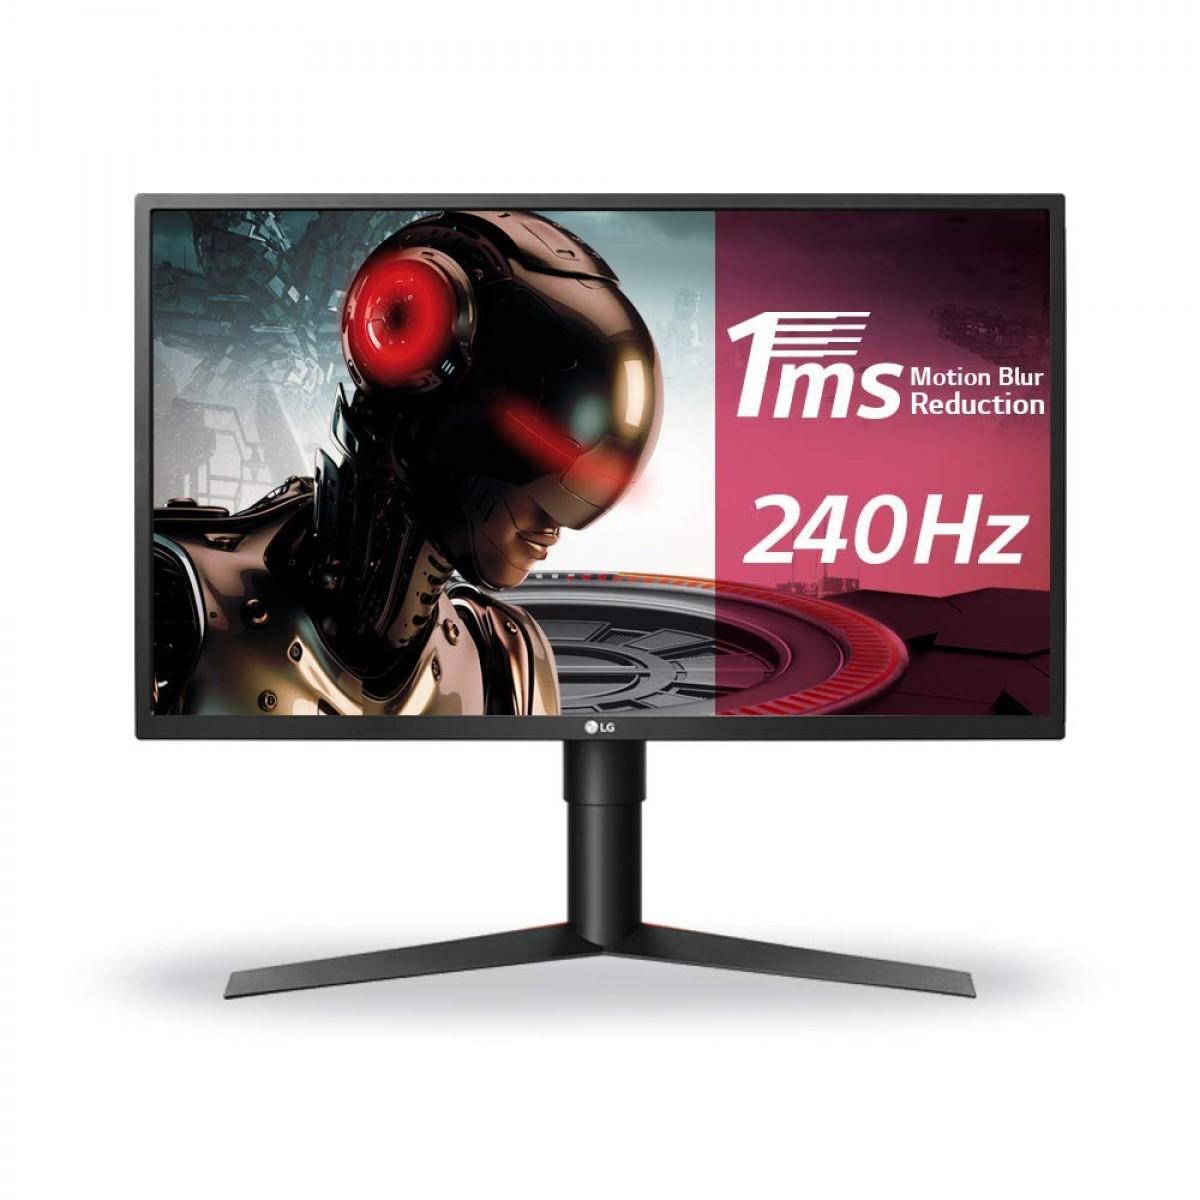 LG 27GK750F 27'' 240HZ 1MS 1080P Gaming Monitor